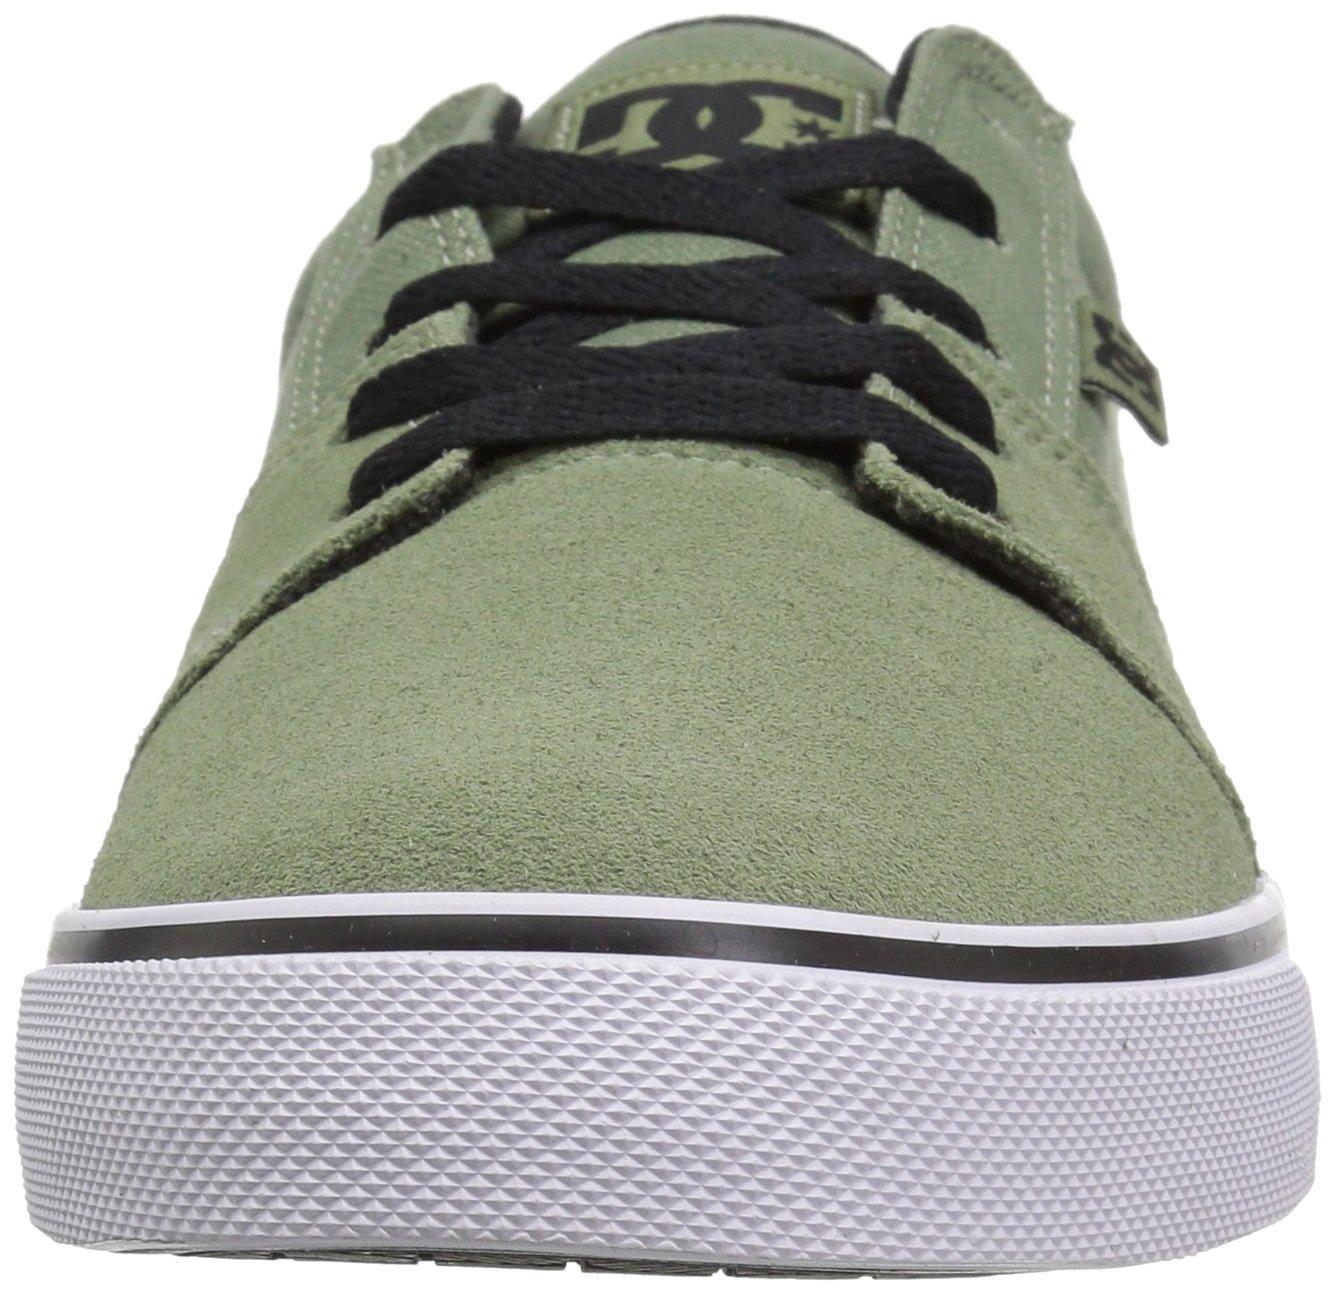 DC TONIK TONIK DC Unisex-Erwachsene Sneakers Olive Nights 528004